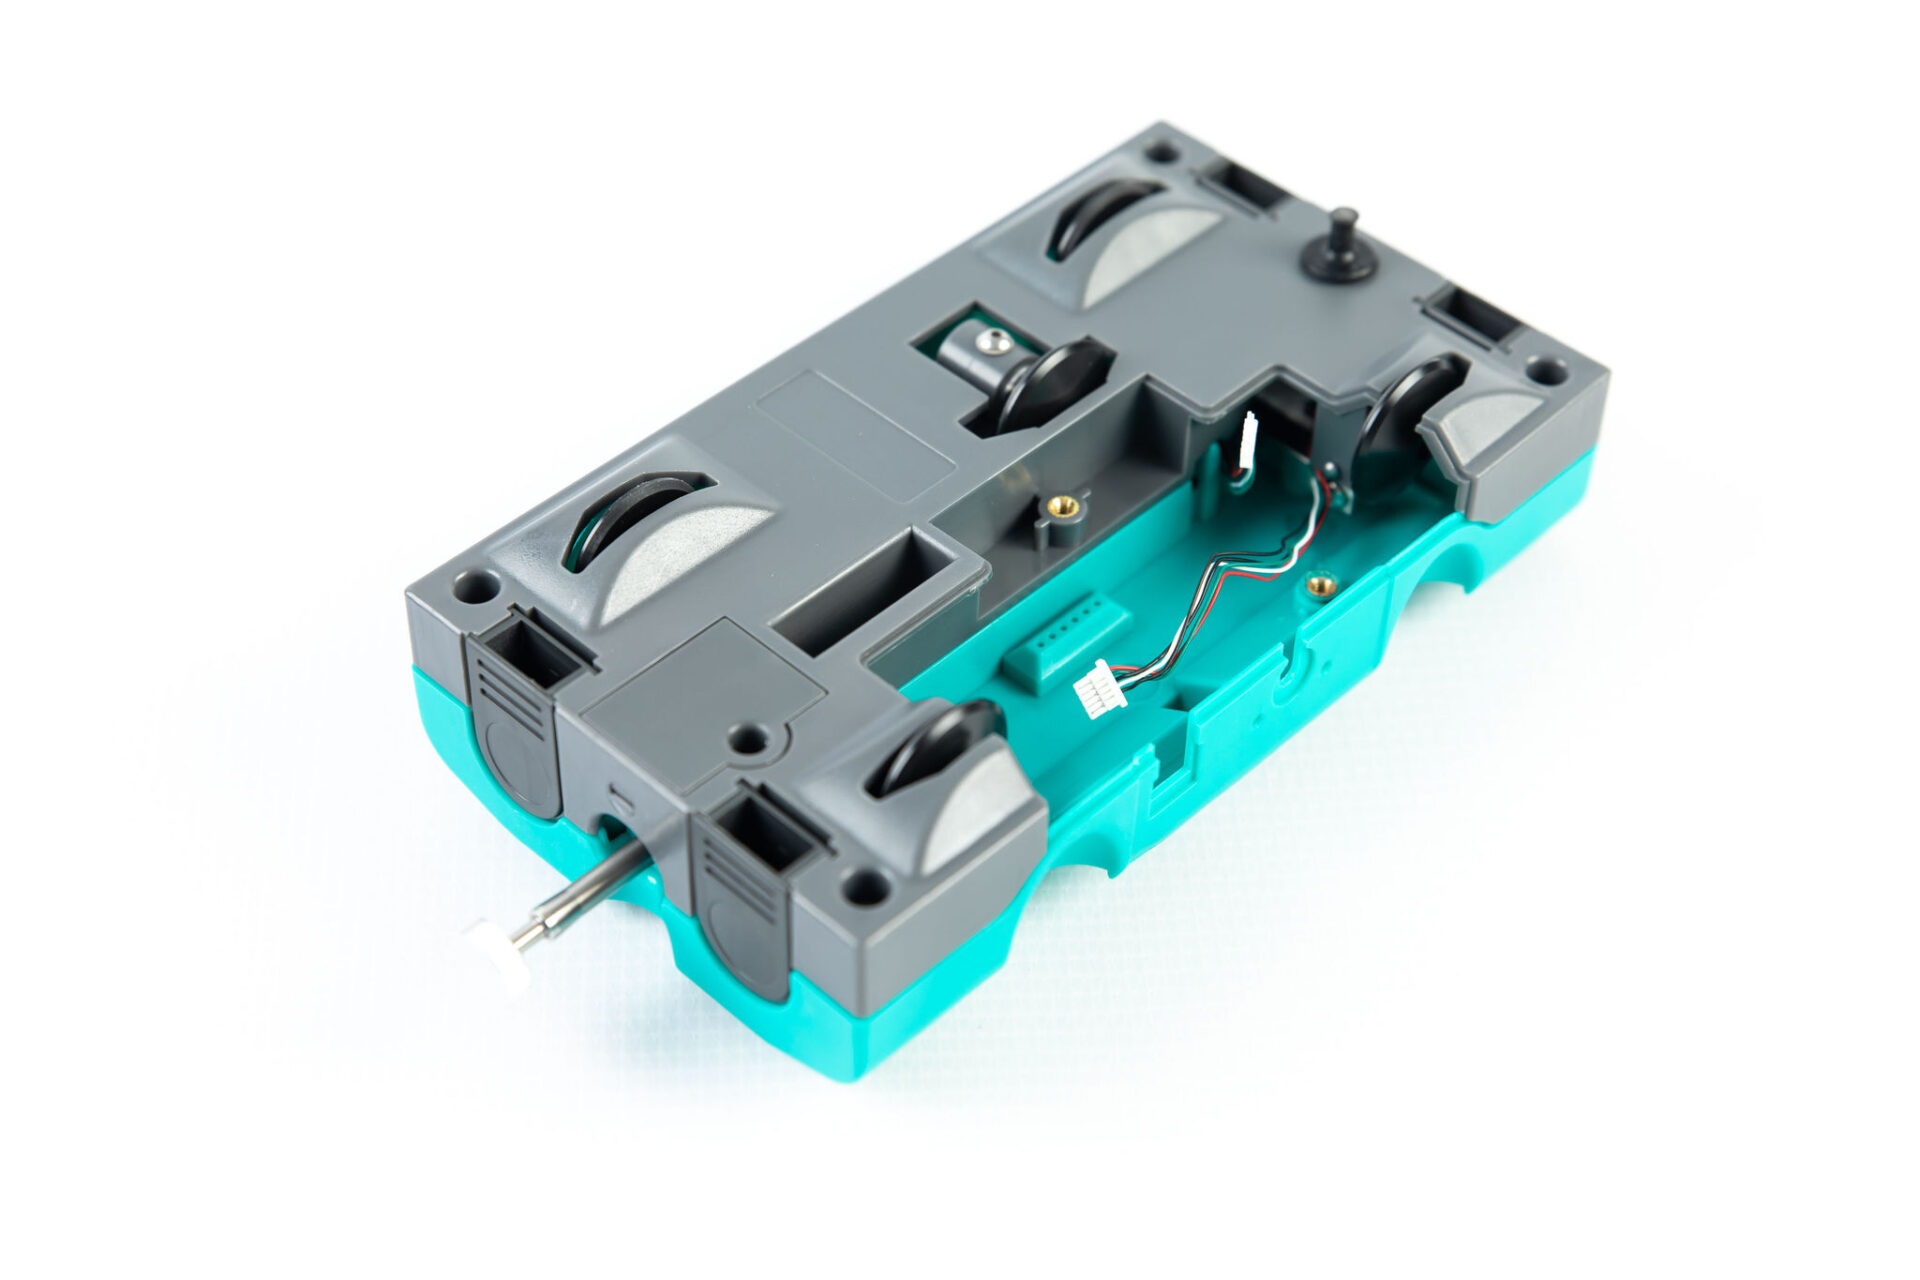 bright turquoise plastic smart dynamics cart